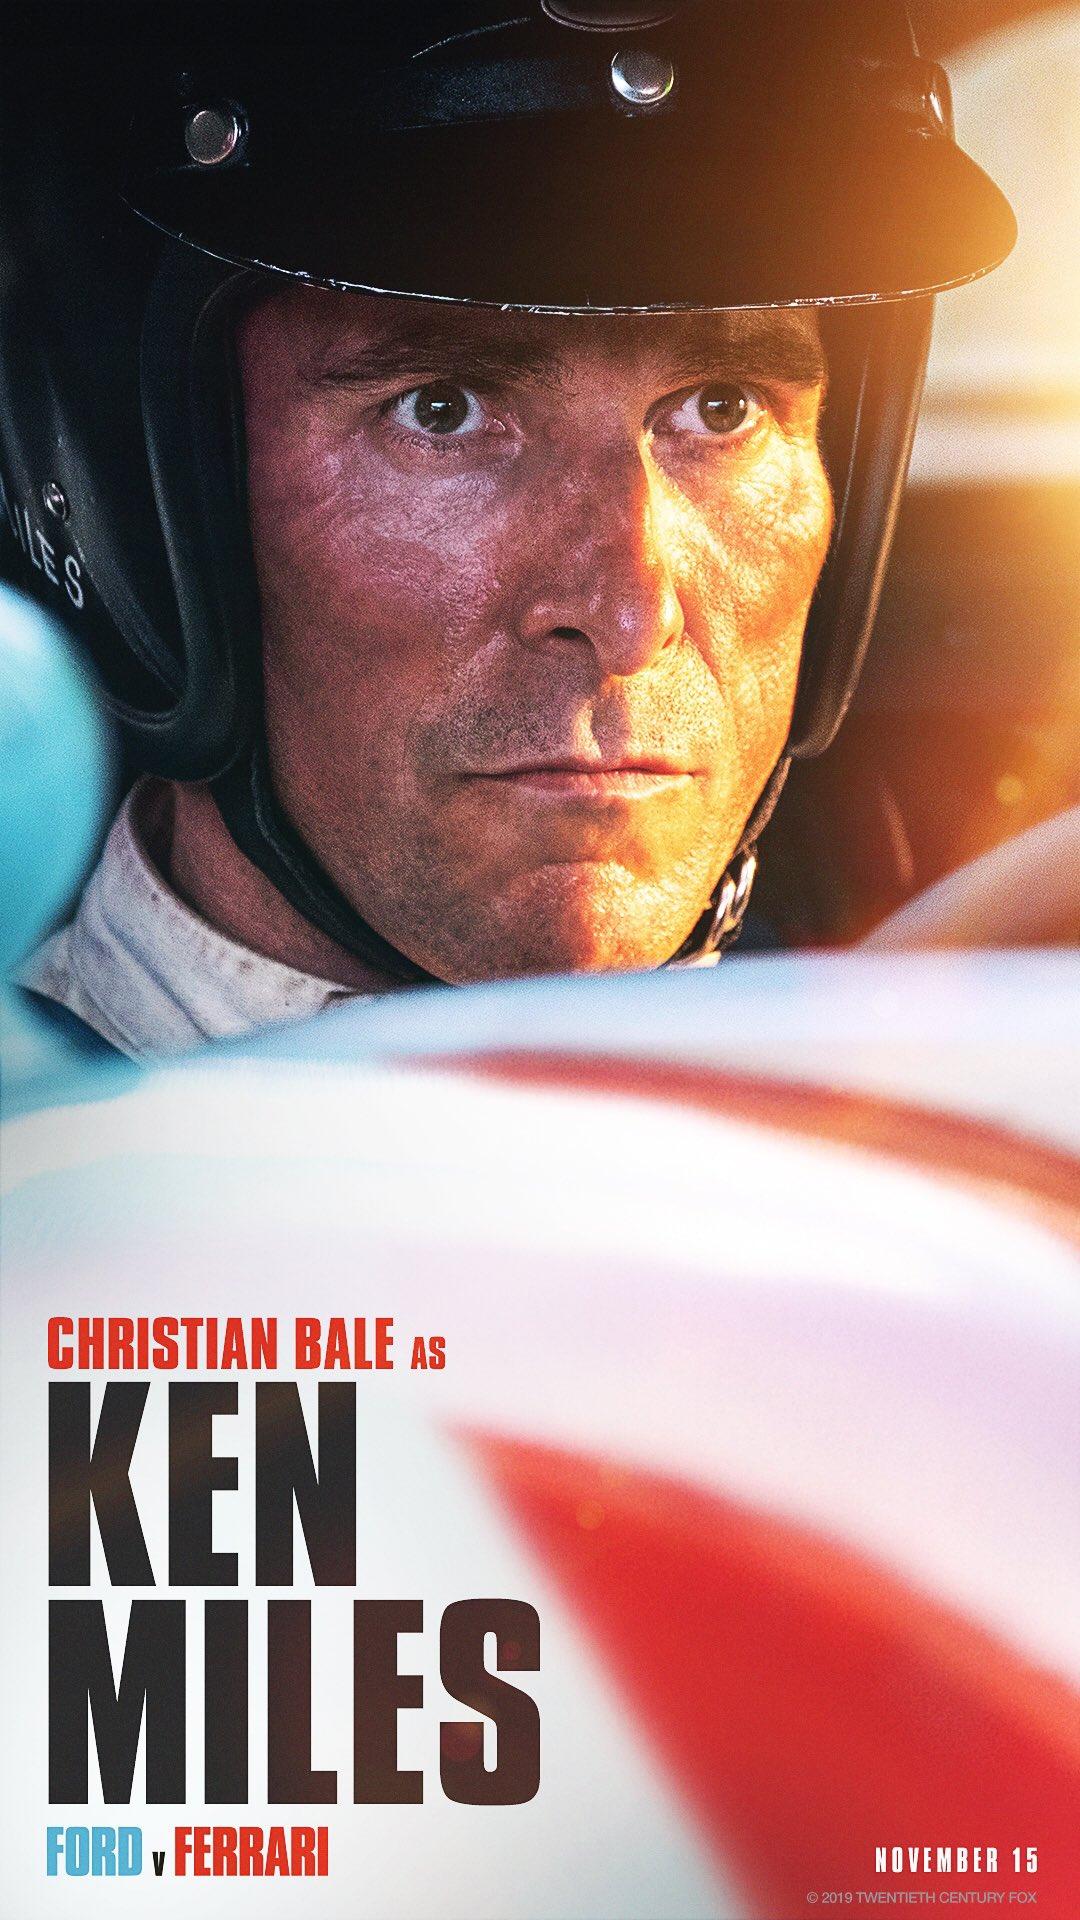 Christian Bale As Ken Miles In Ford V Ferrari Looks Hauntingly Similar To The Racer Goodtimes Lifestyle Food Travel Fashion Weddings Bollywood Tech Videos Photos